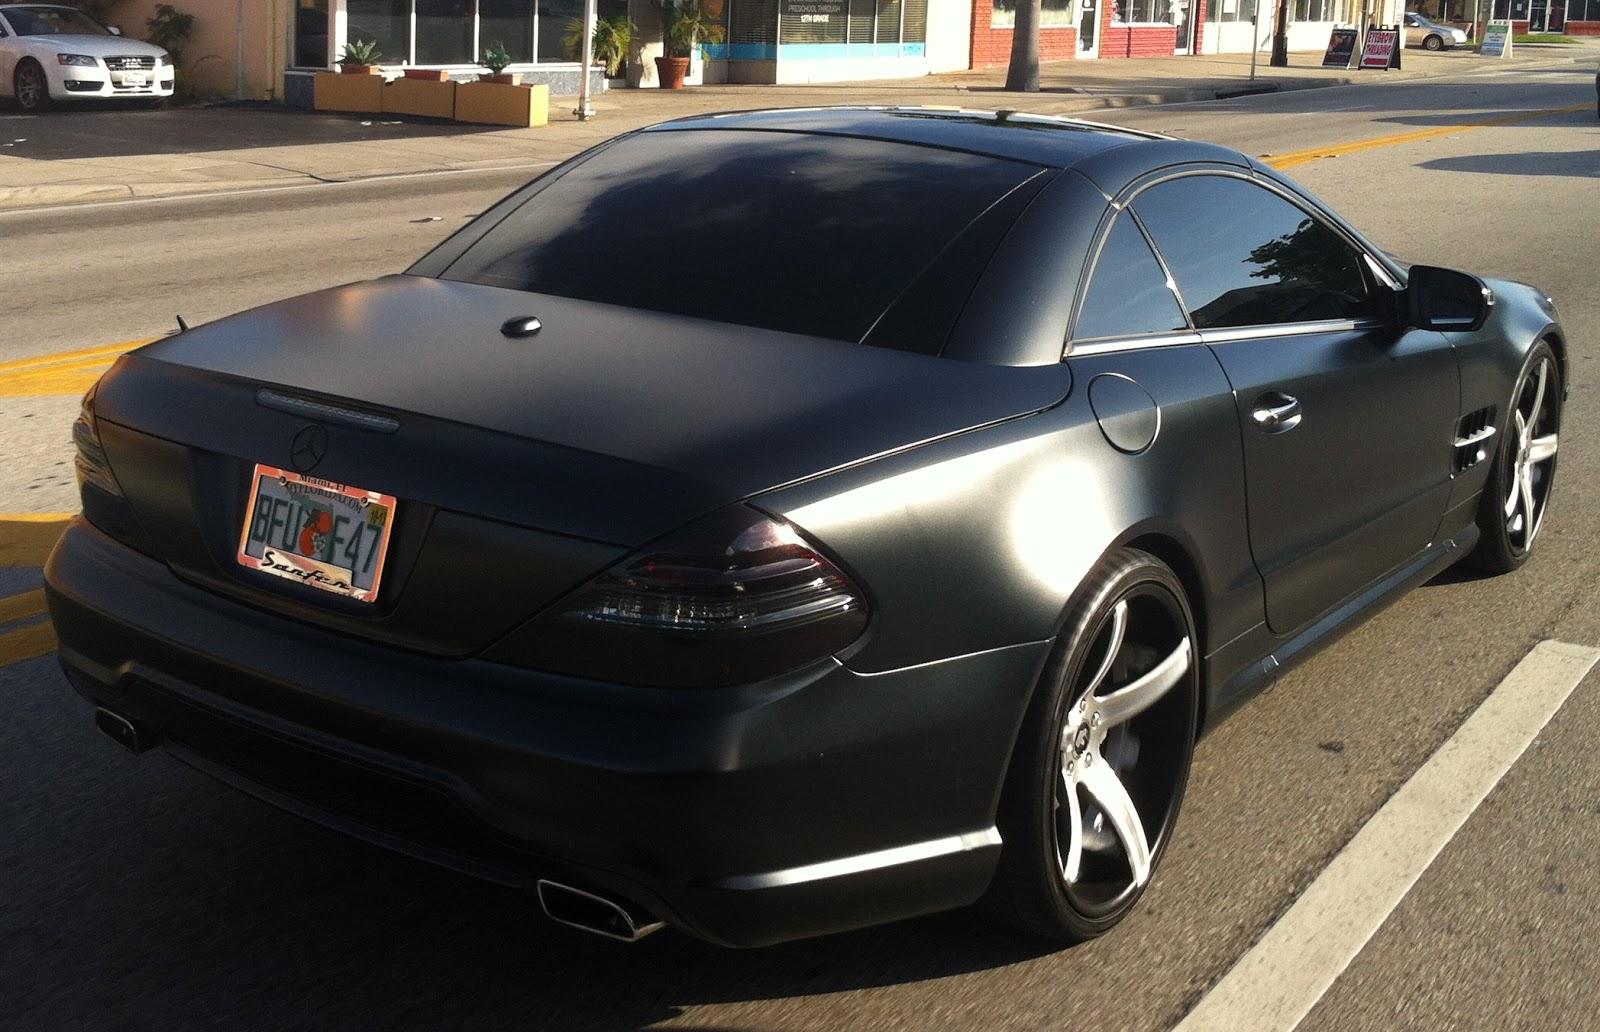 matte black mercedes sl 550 exotic cars on the streets of miami. Black Bedroom Furniture Sets. Home Design Ideas